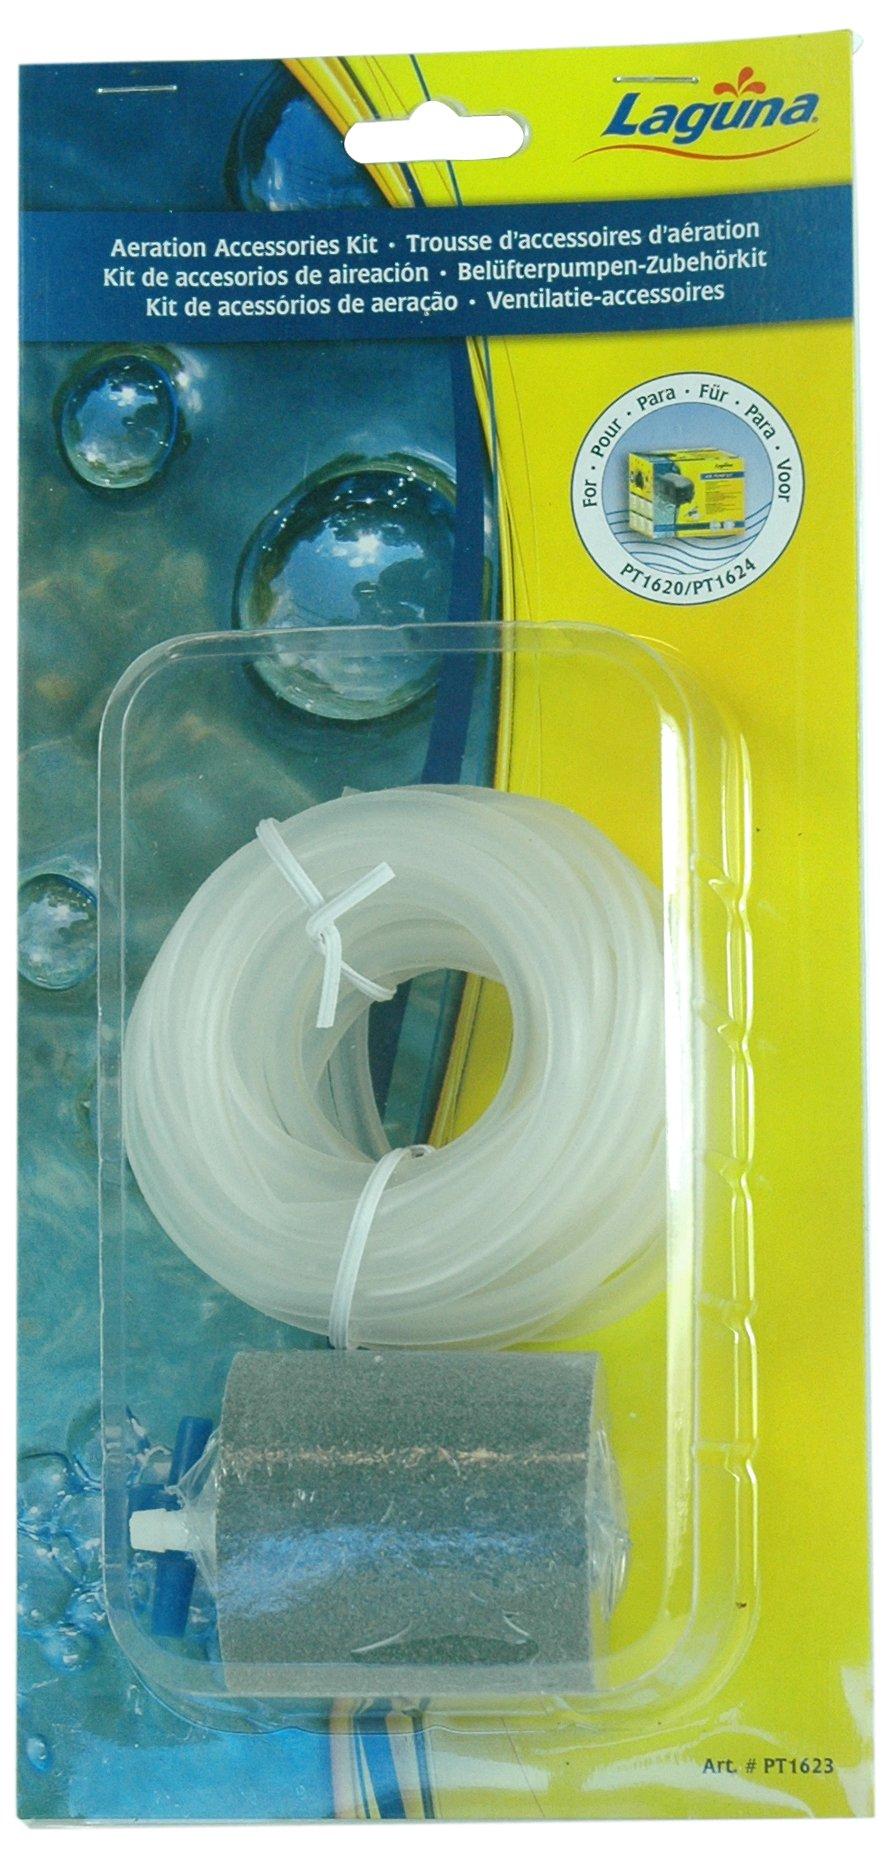 Laguna Aeration Accessories Kit for Ponds by Laguna